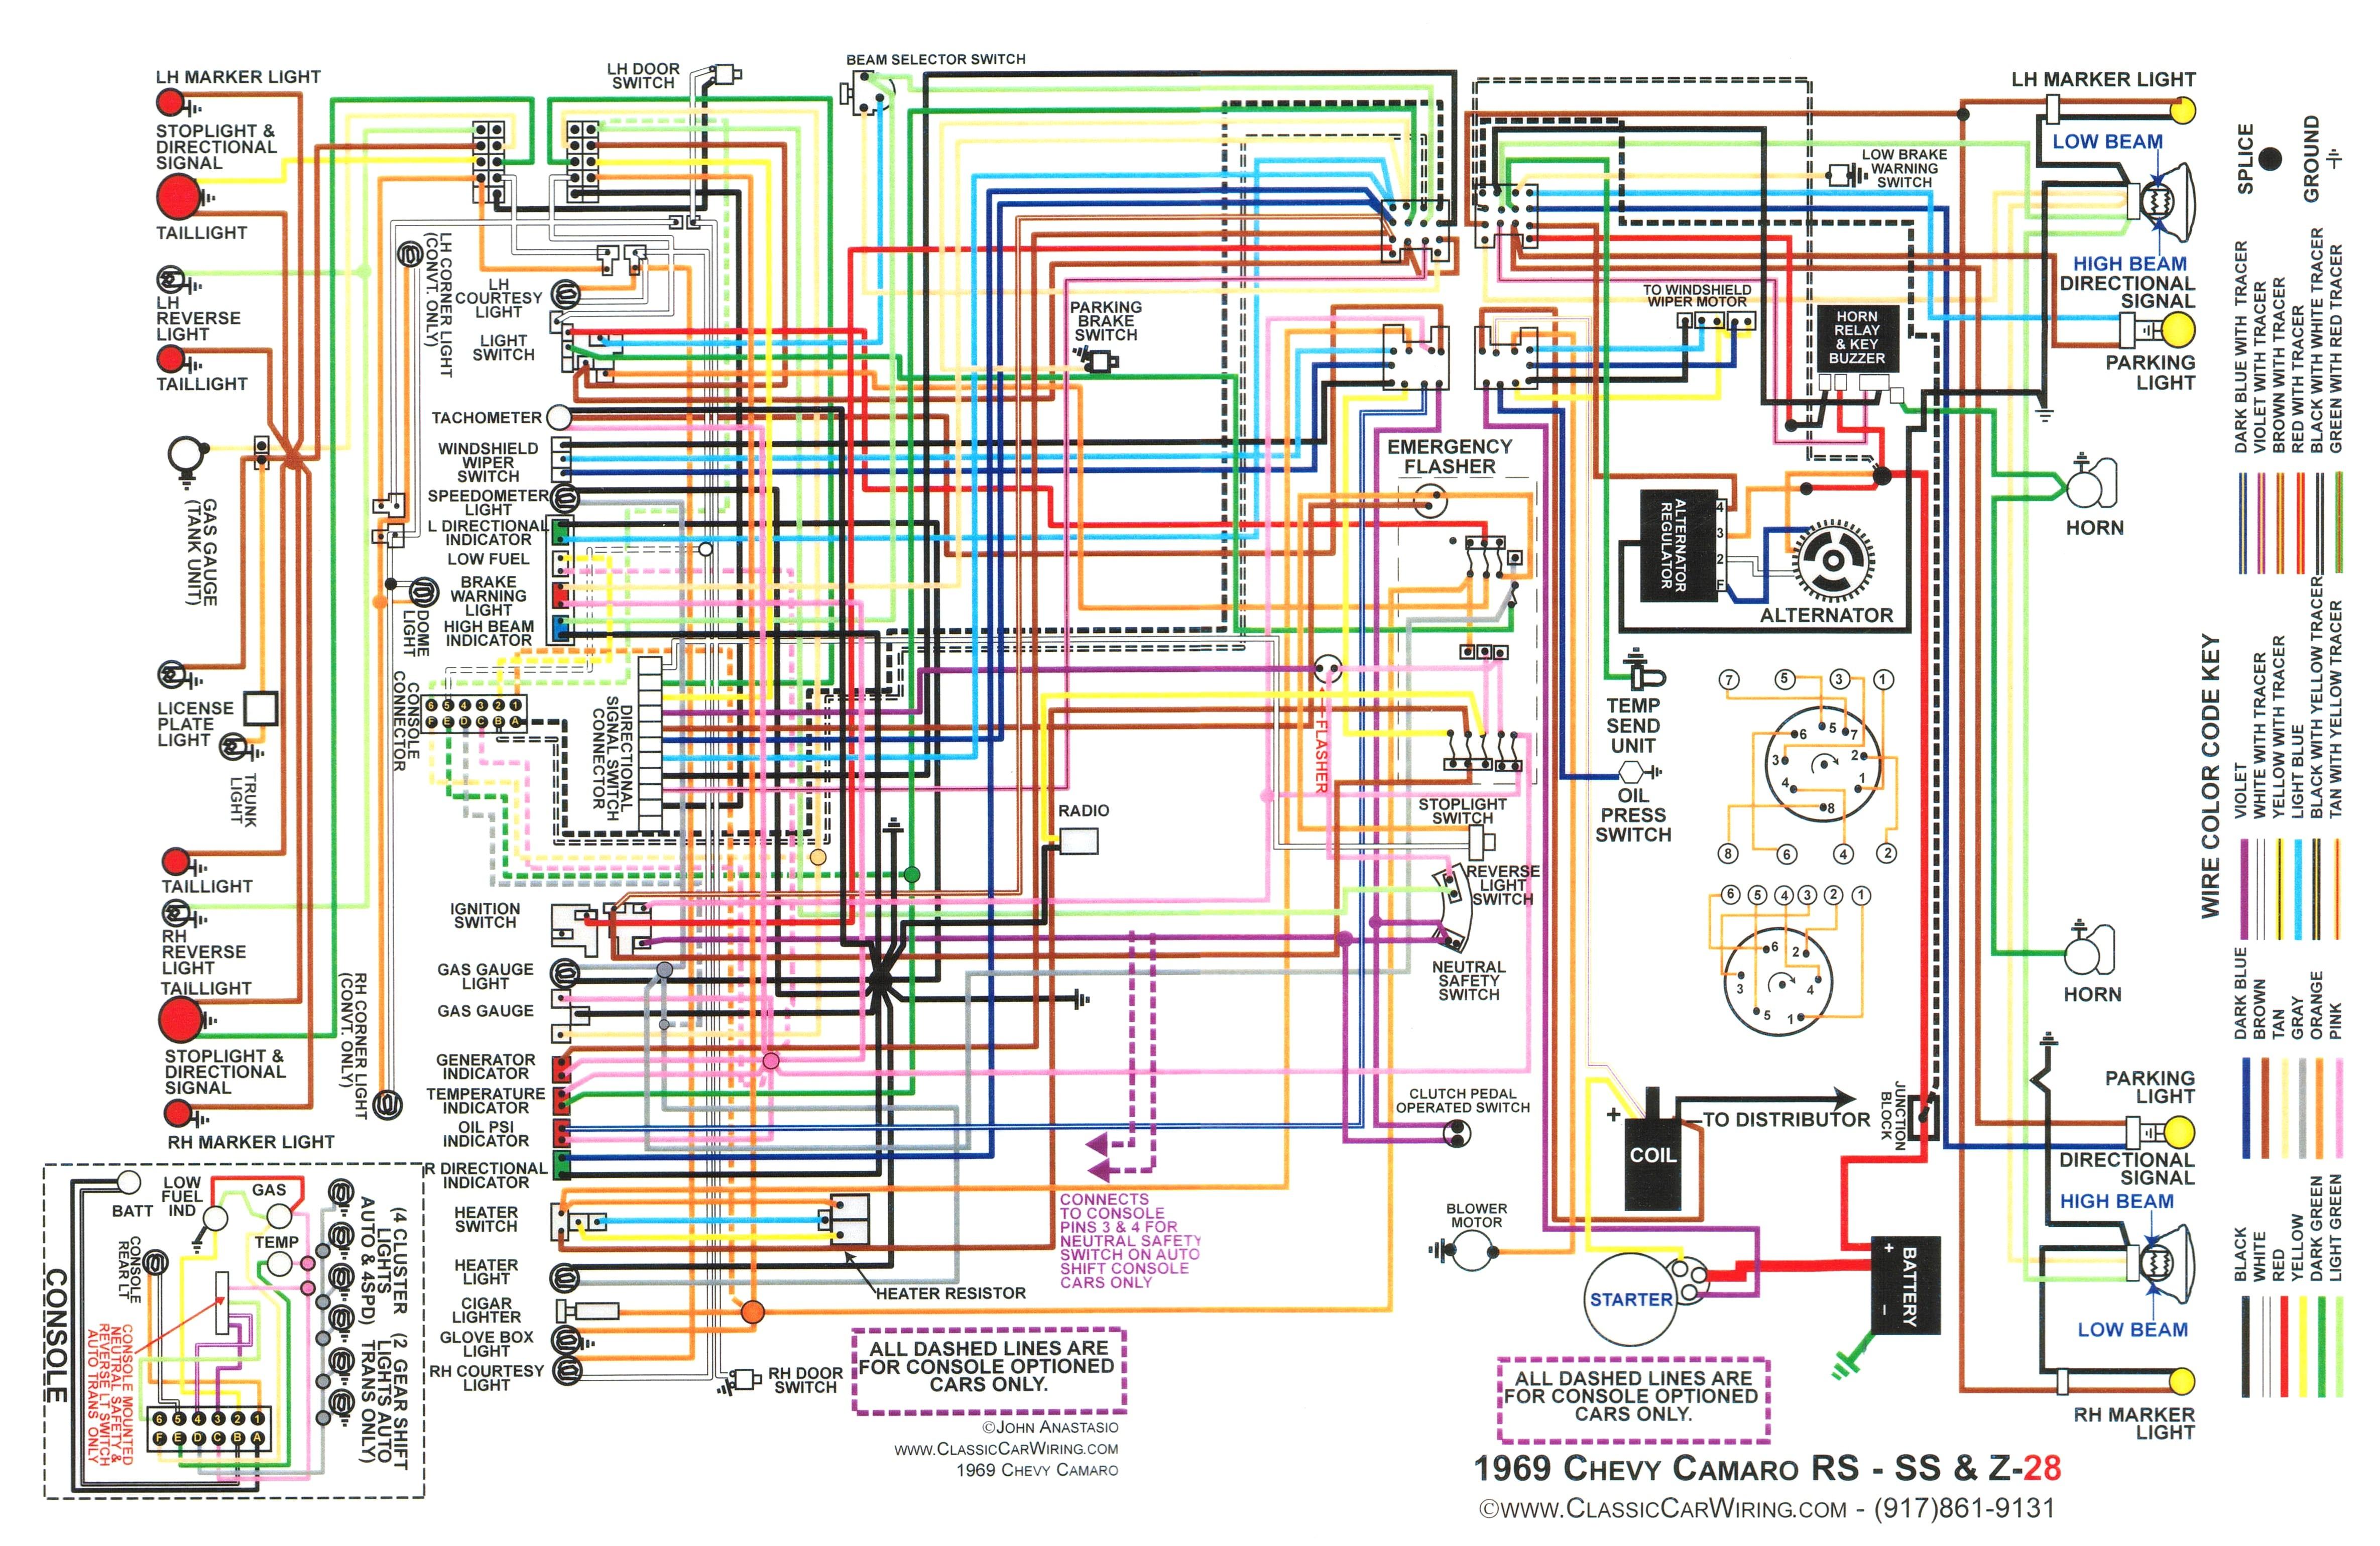 1969 camaro wiring harness diagram wiring diagram database 1967 Camaro RS Headlight Wiring Diagram 69 camaro ss wiring diagram change your idea with wiring diagram 69 camaro tail light wiring 1969 camaro wiring harness diagram